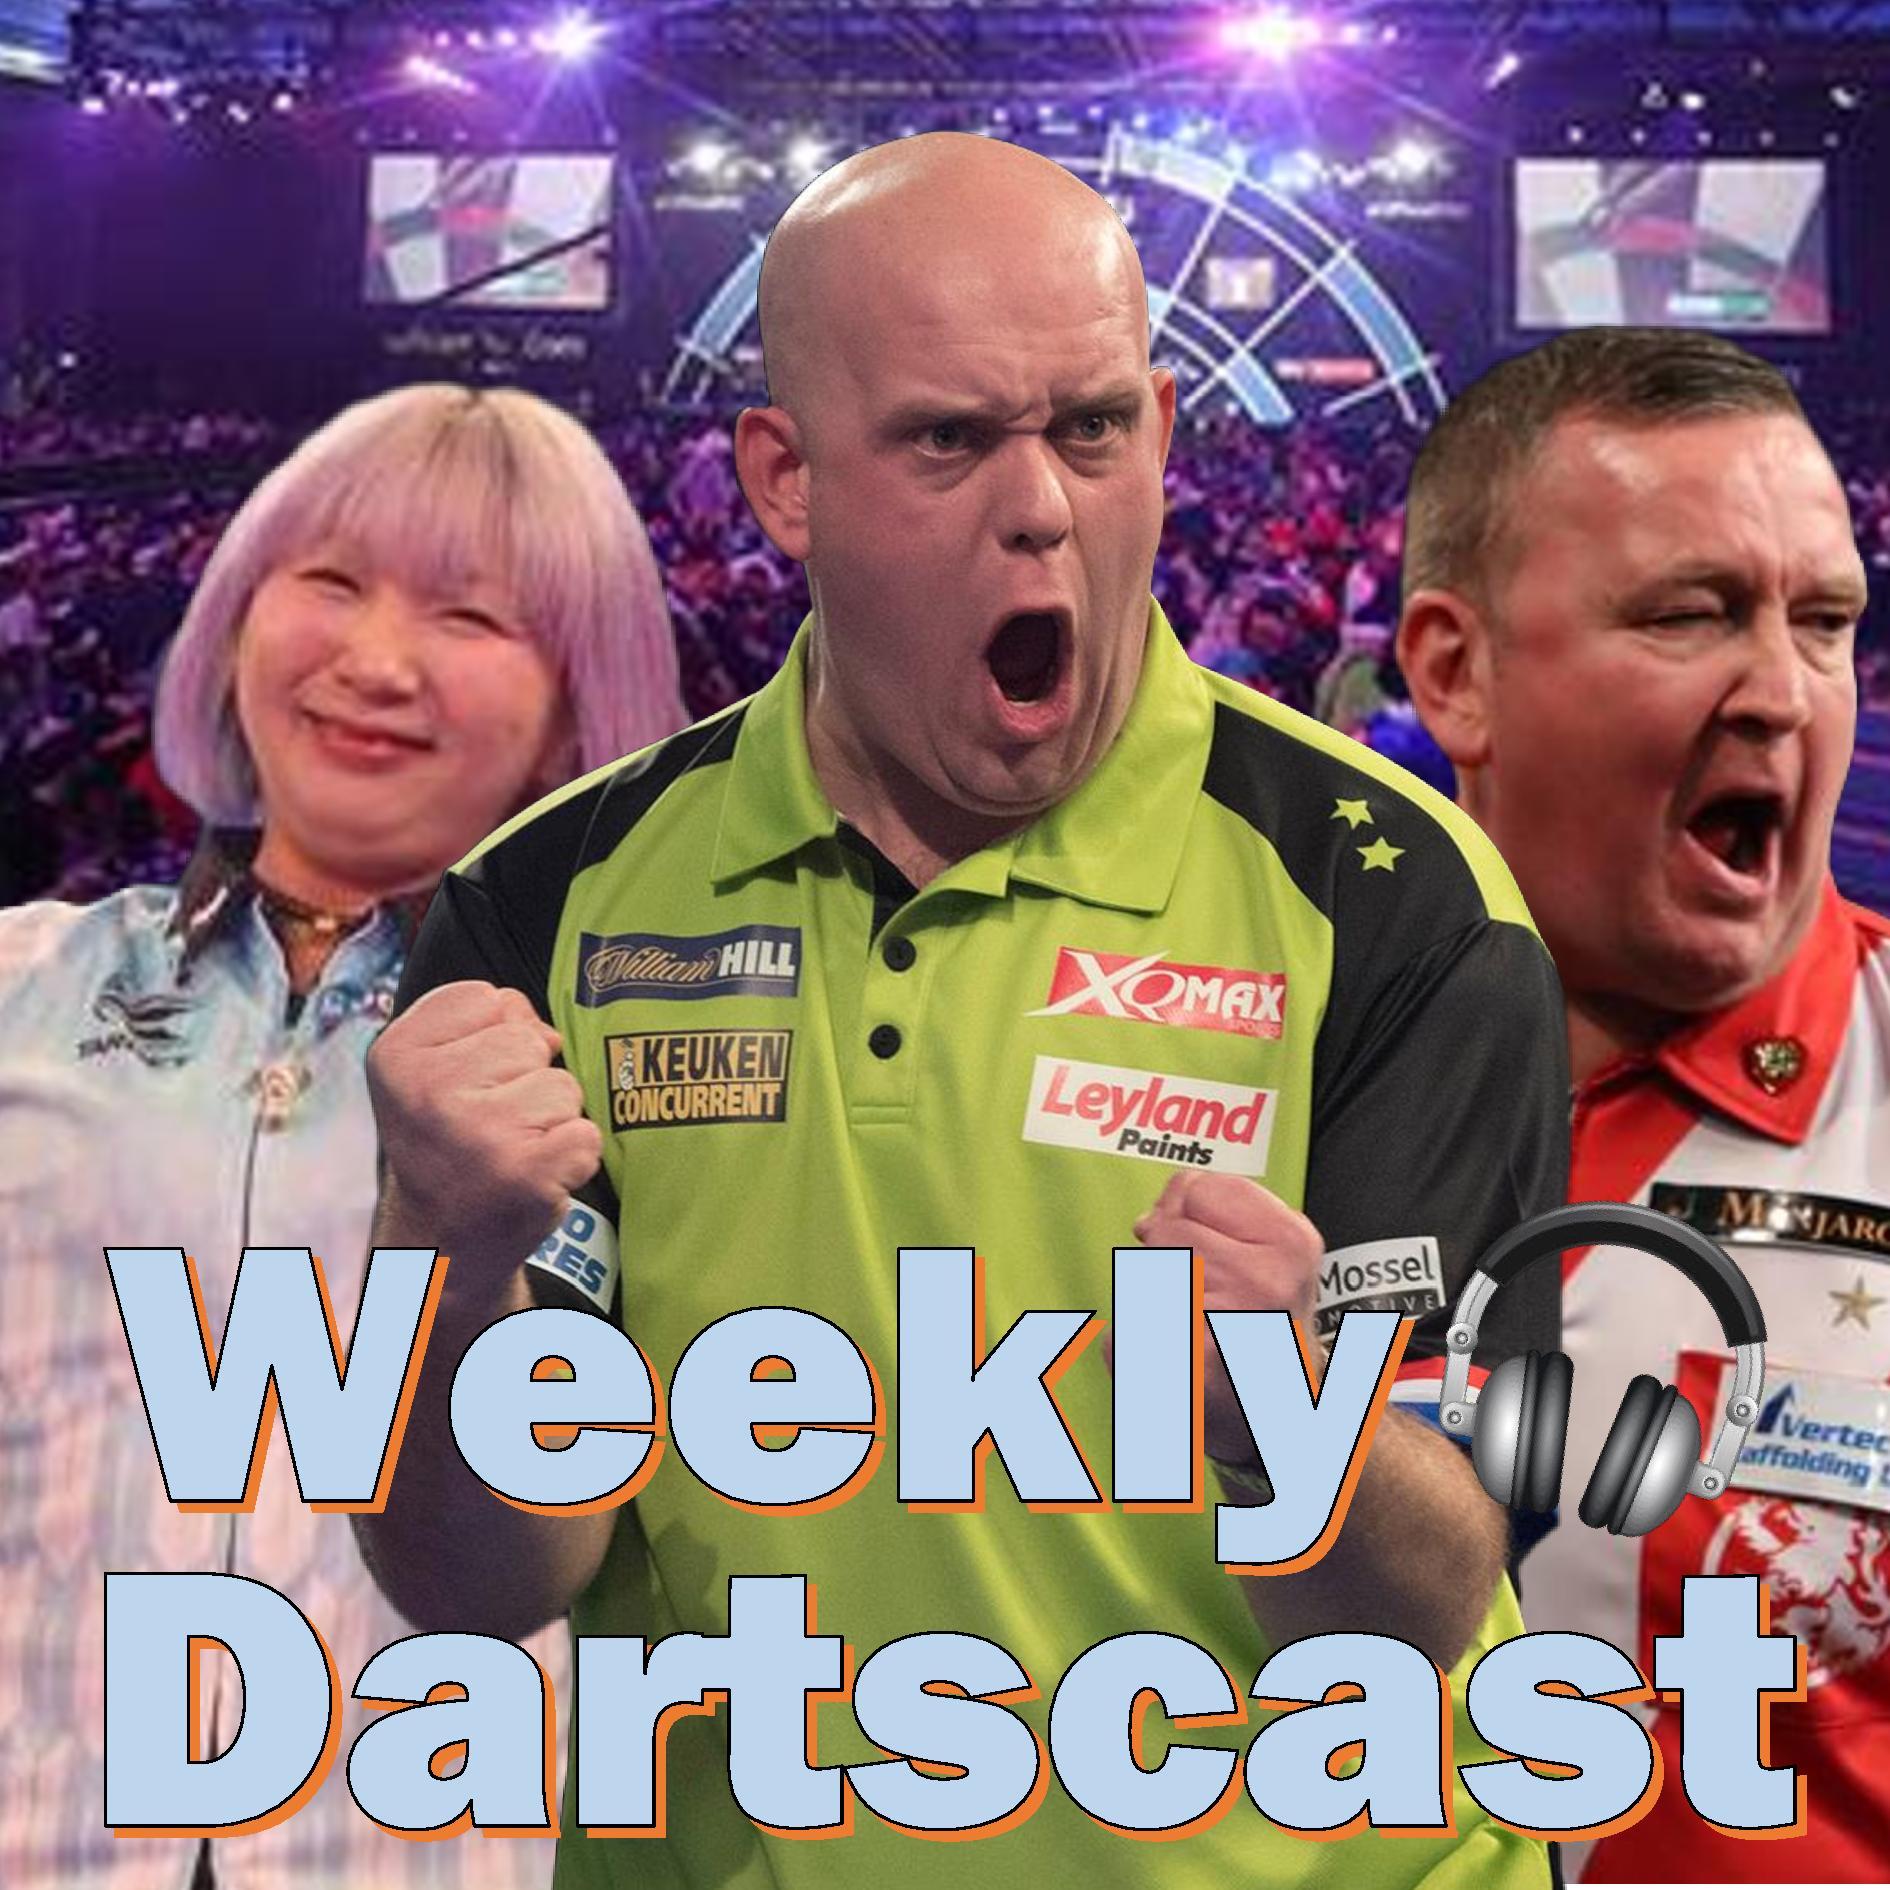 The Weekly Dartscast